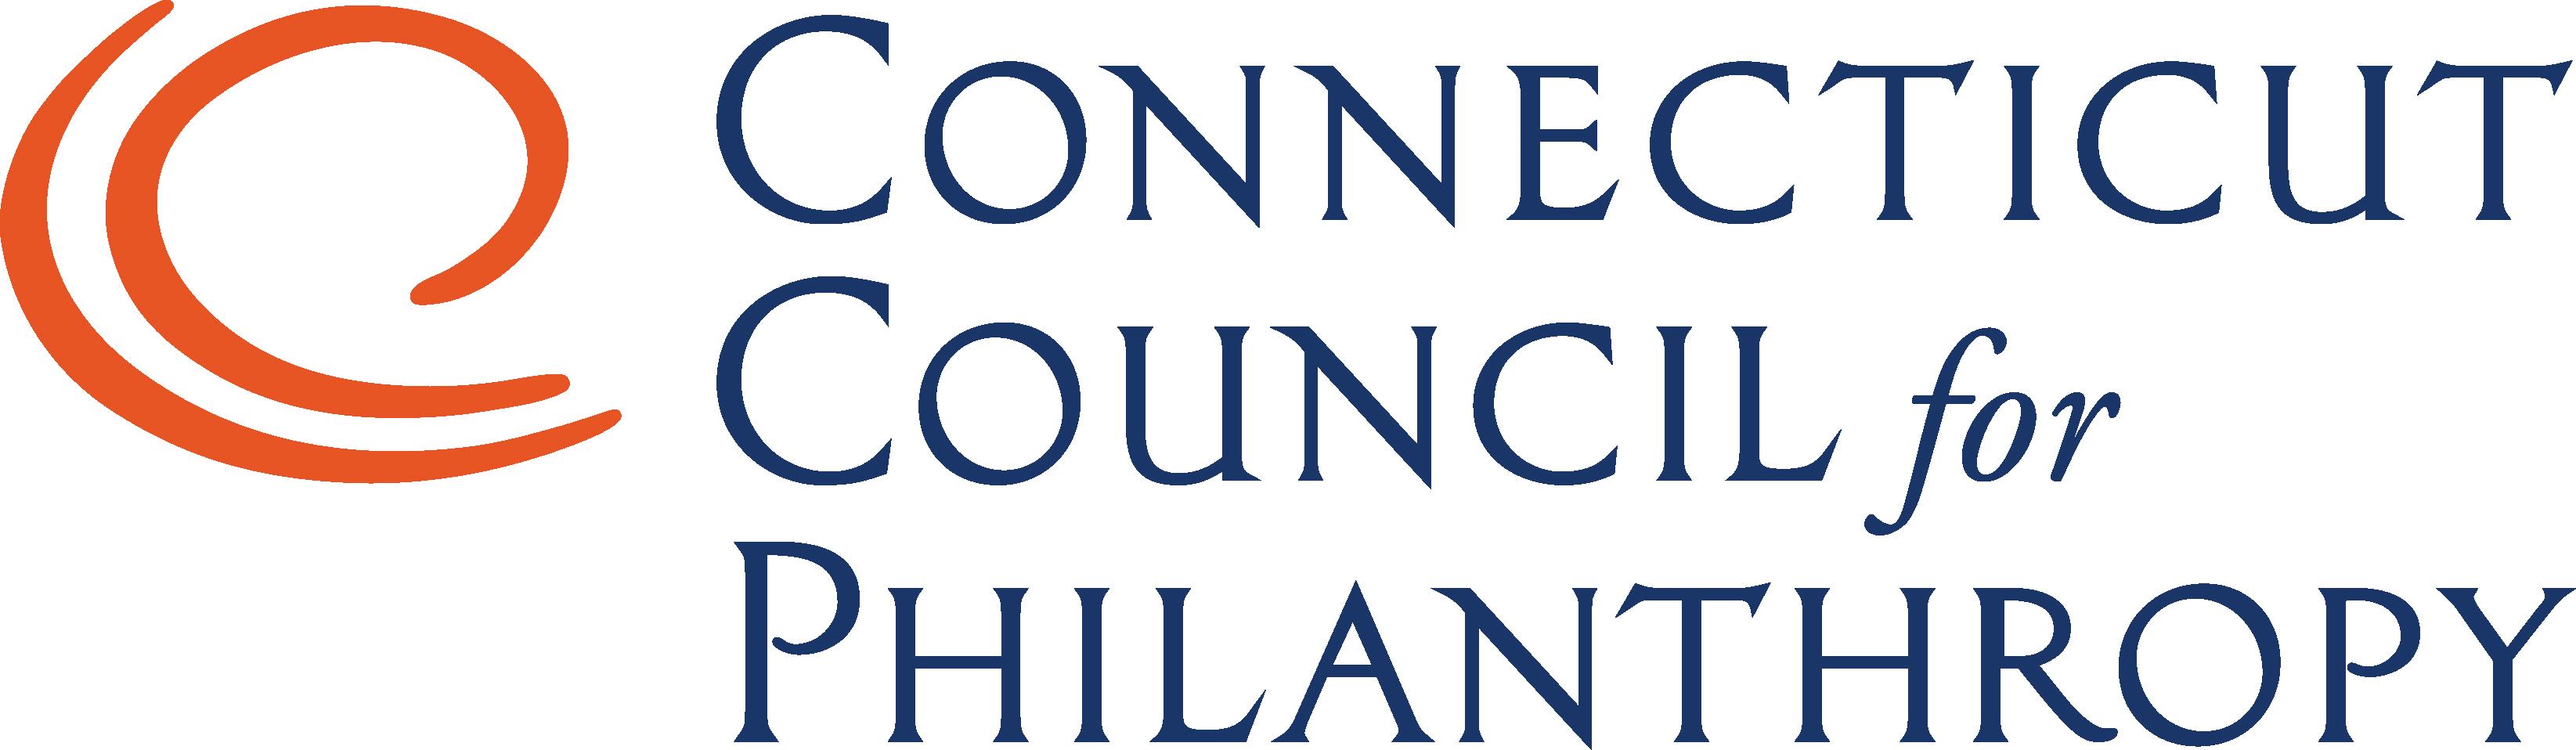 CCP.logo.294_166.highres.jpg